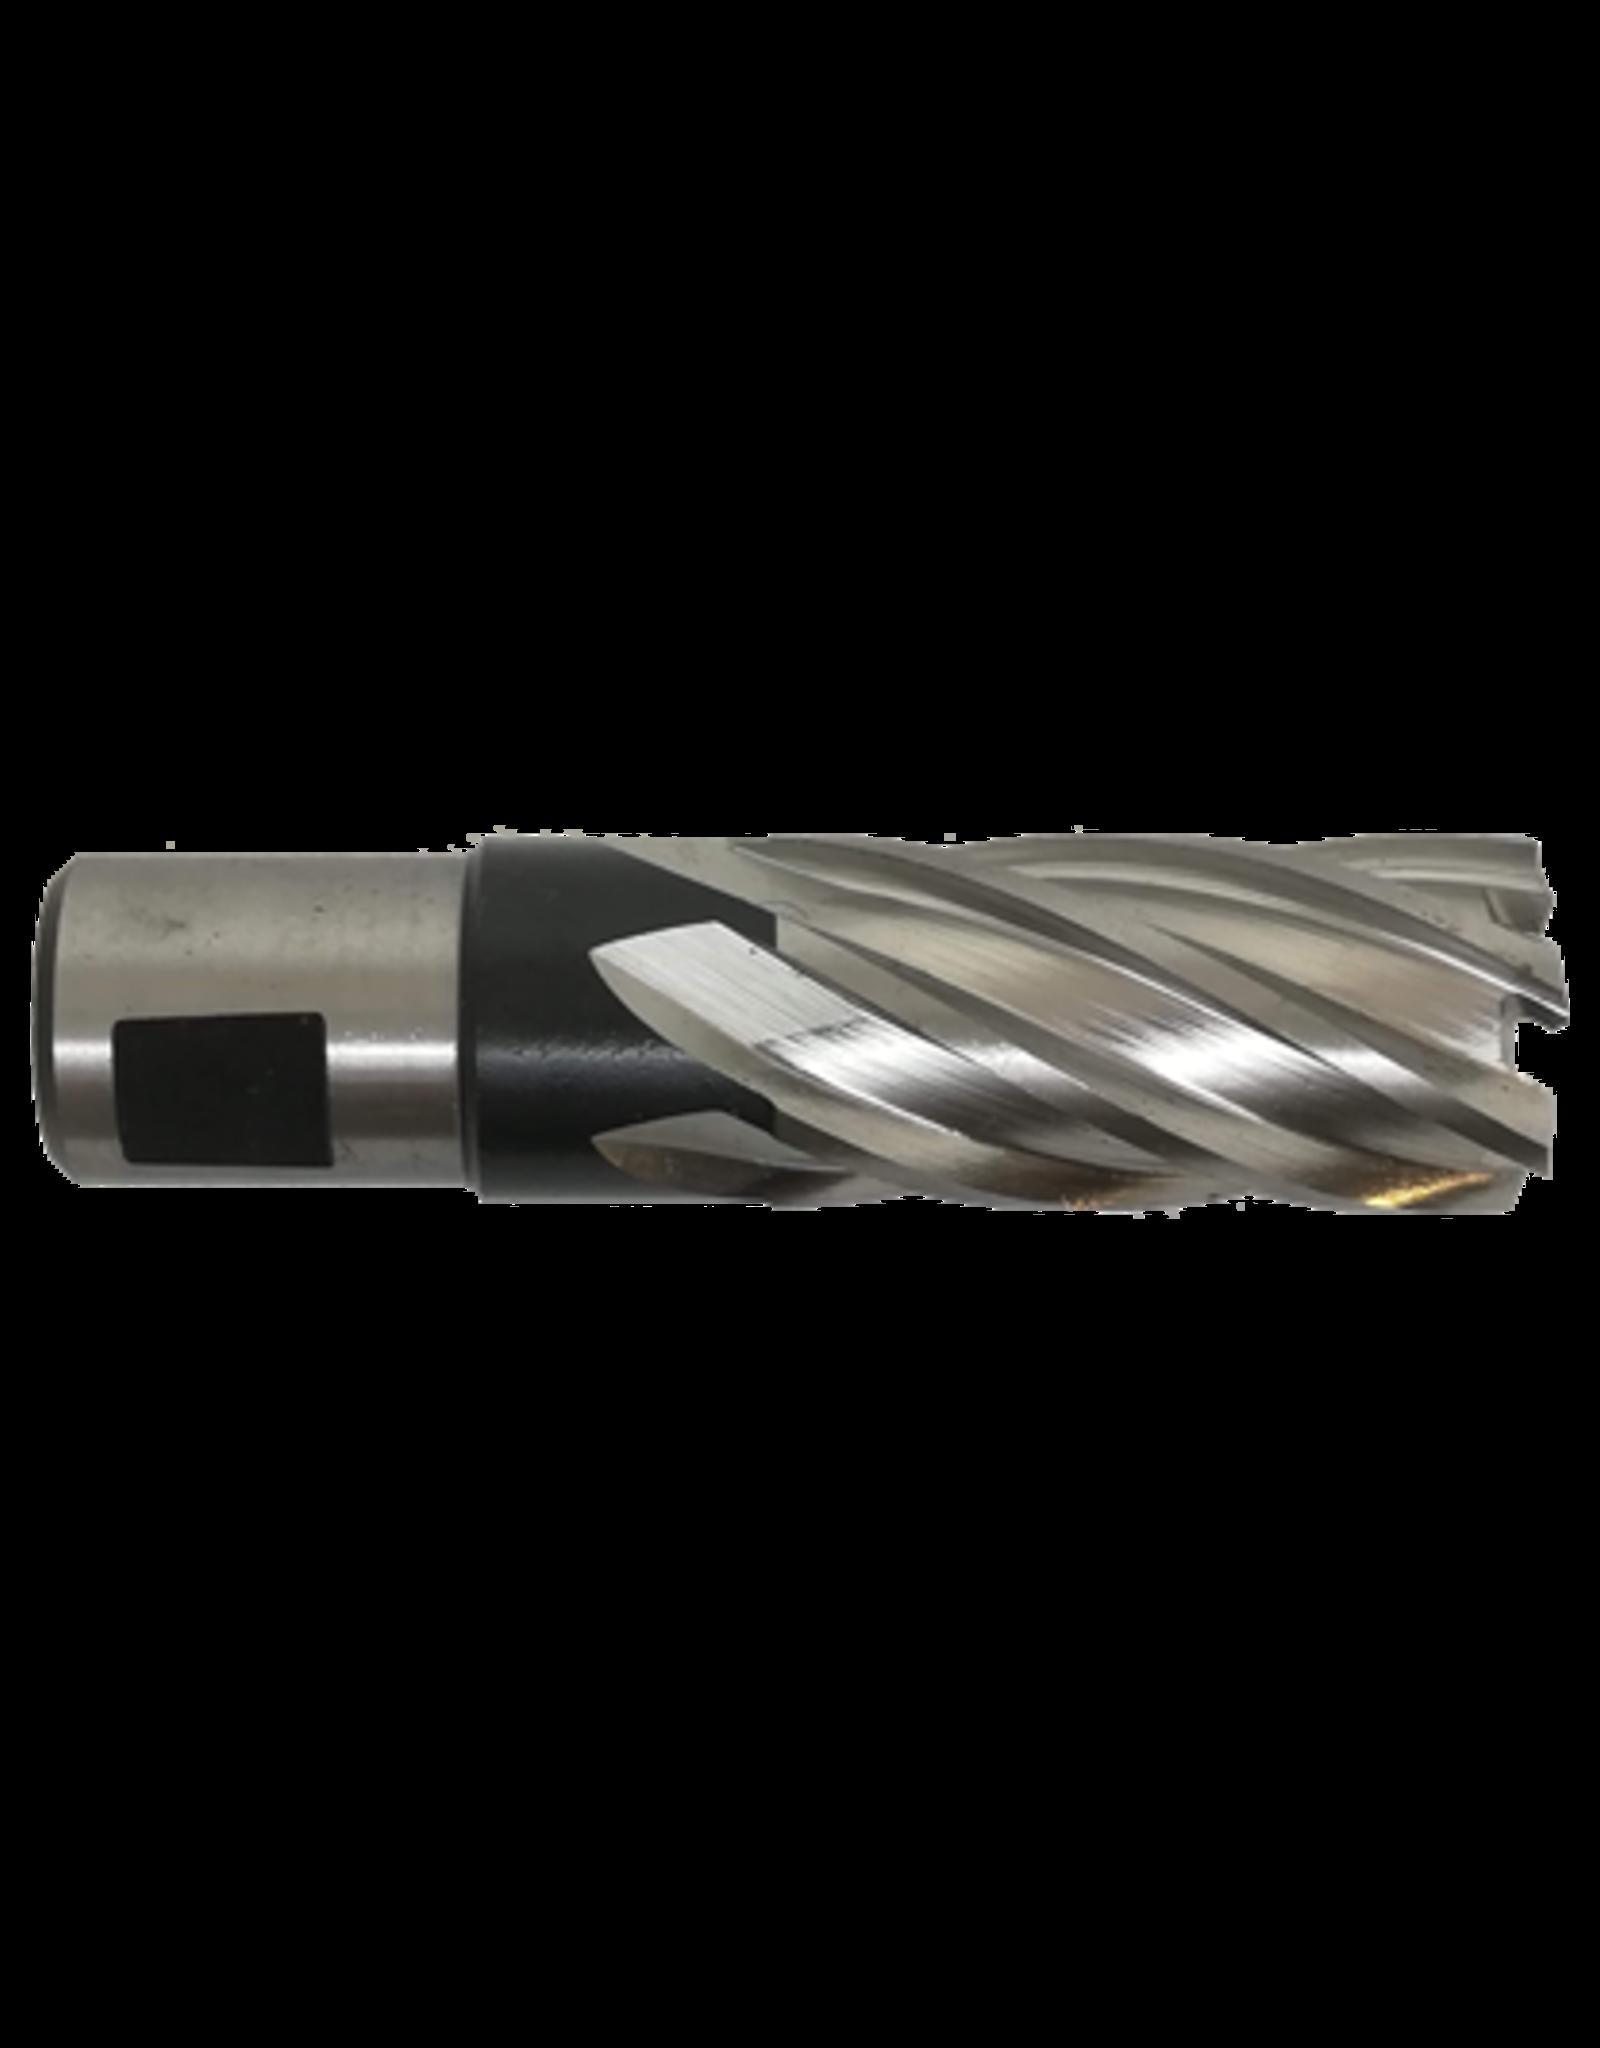 Evolution Power Tools Steel Line EVOLUTION CORE CUTTER LONG - 22 MM